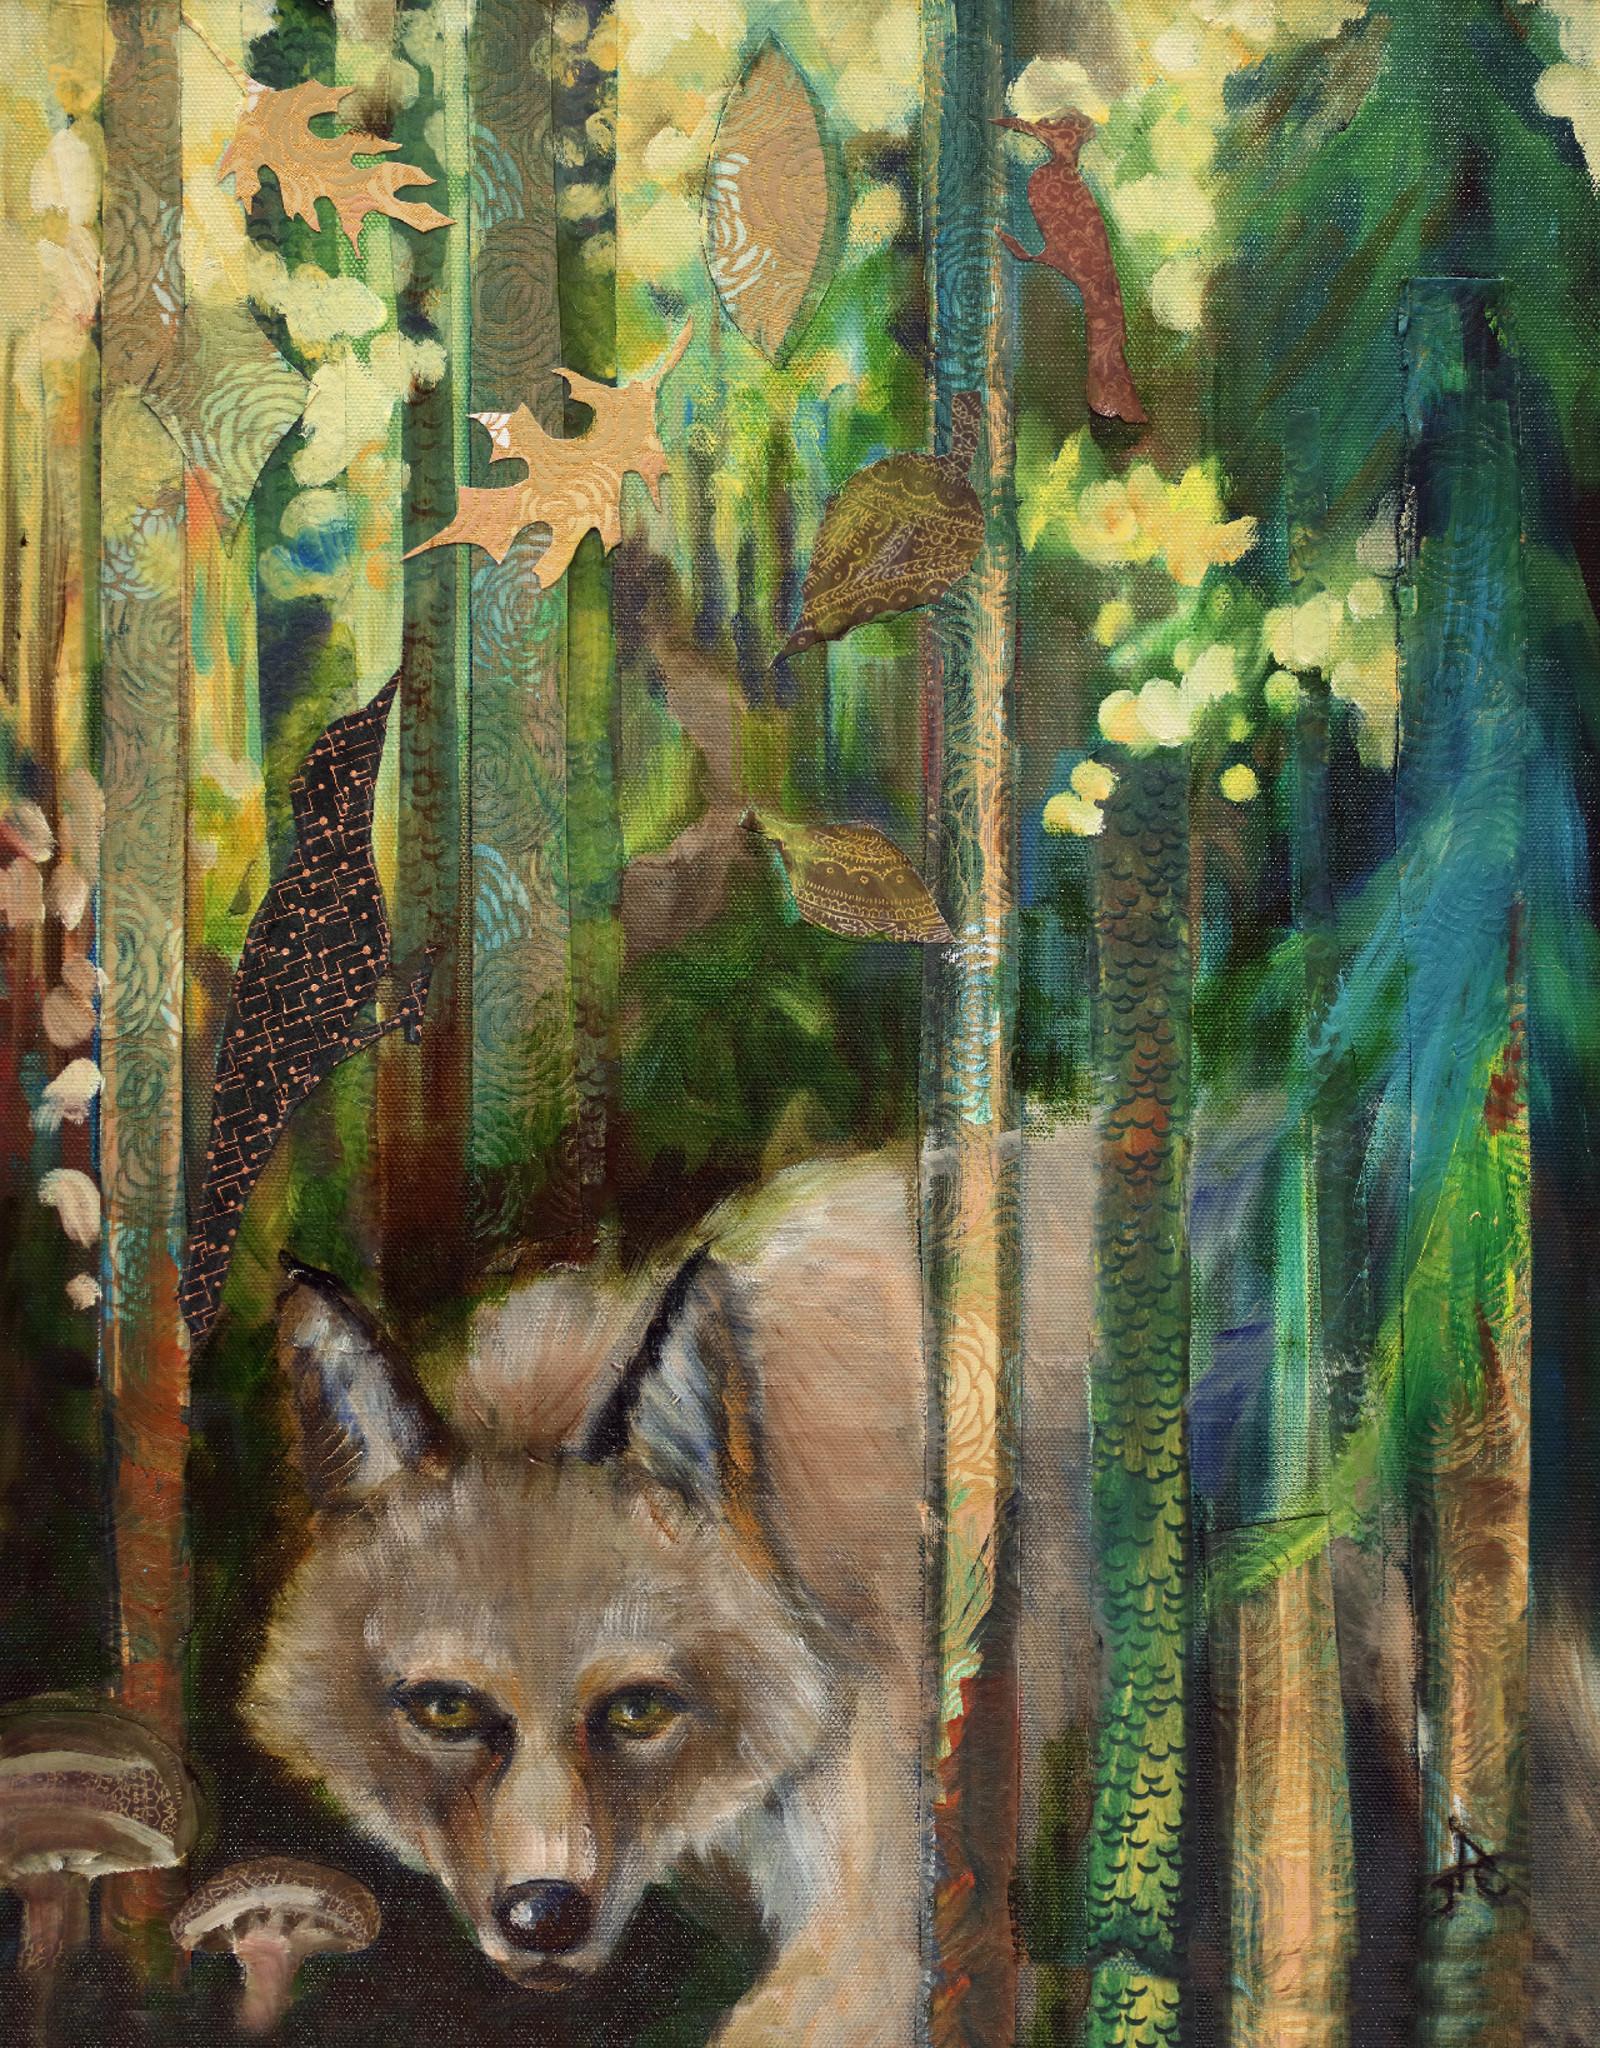 Jennifer Cook-Chrysos Chrysos Designs Artworks, Archival Print-Coyote, 16 x 20